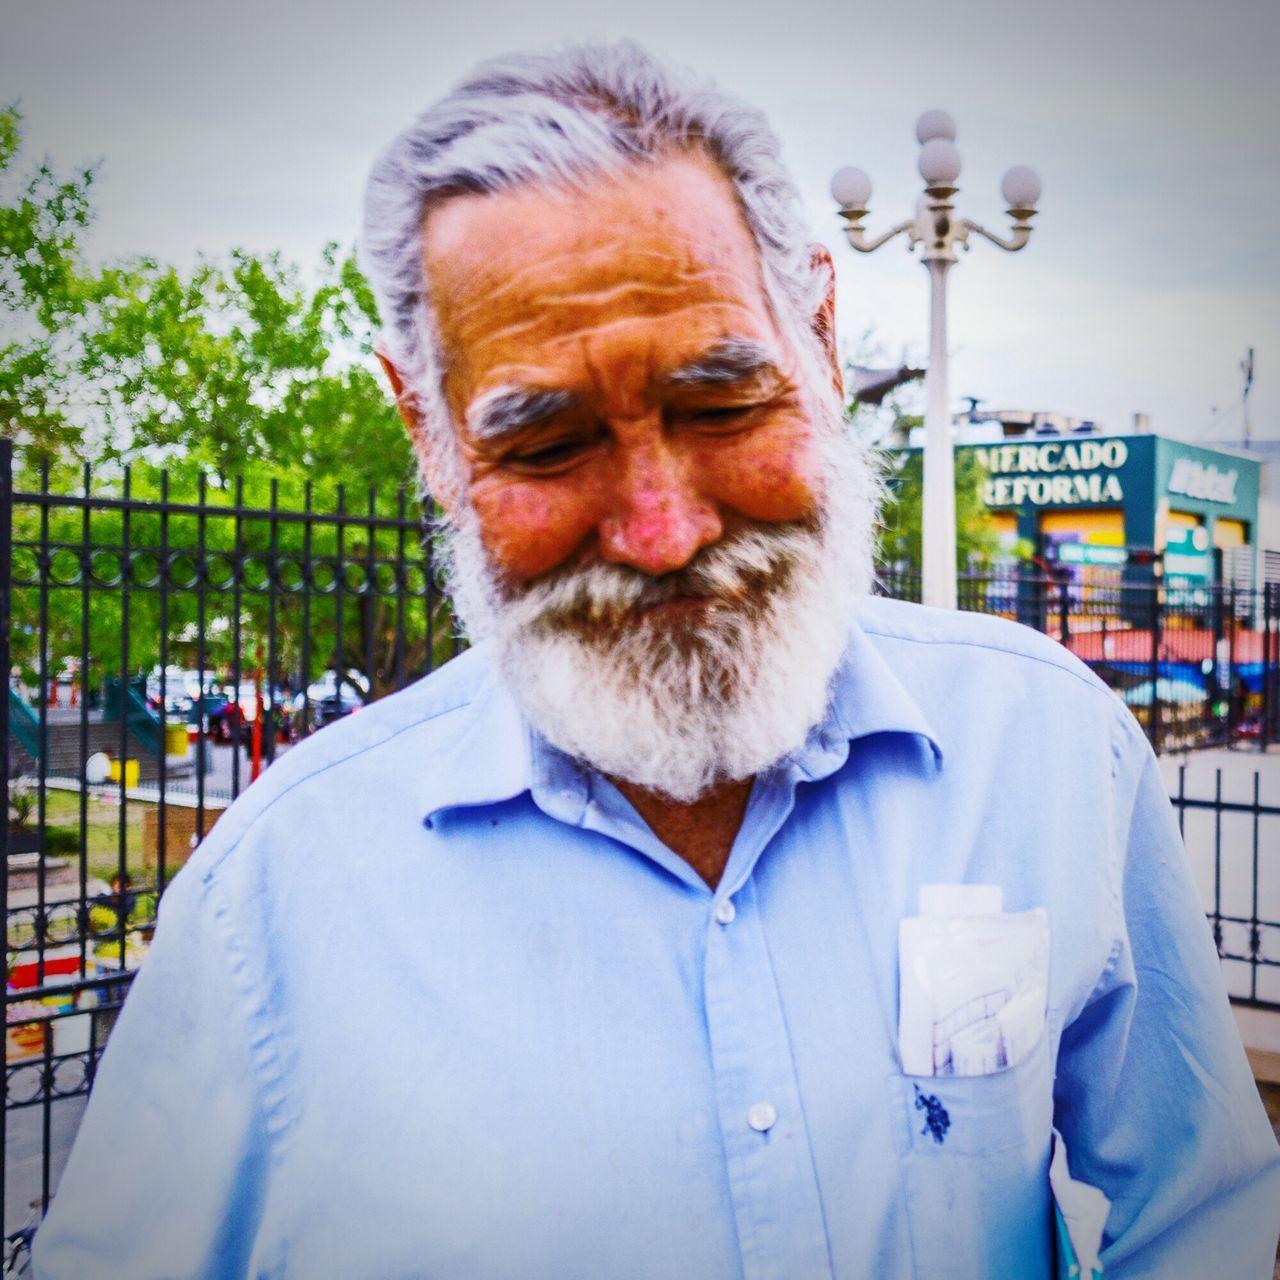 Beard Adult Mature Adult Men City People Street Streetphotography Juarez Senior Adult Downtown Sunday Spring Culture Street Life Urban Photography Sonya6000